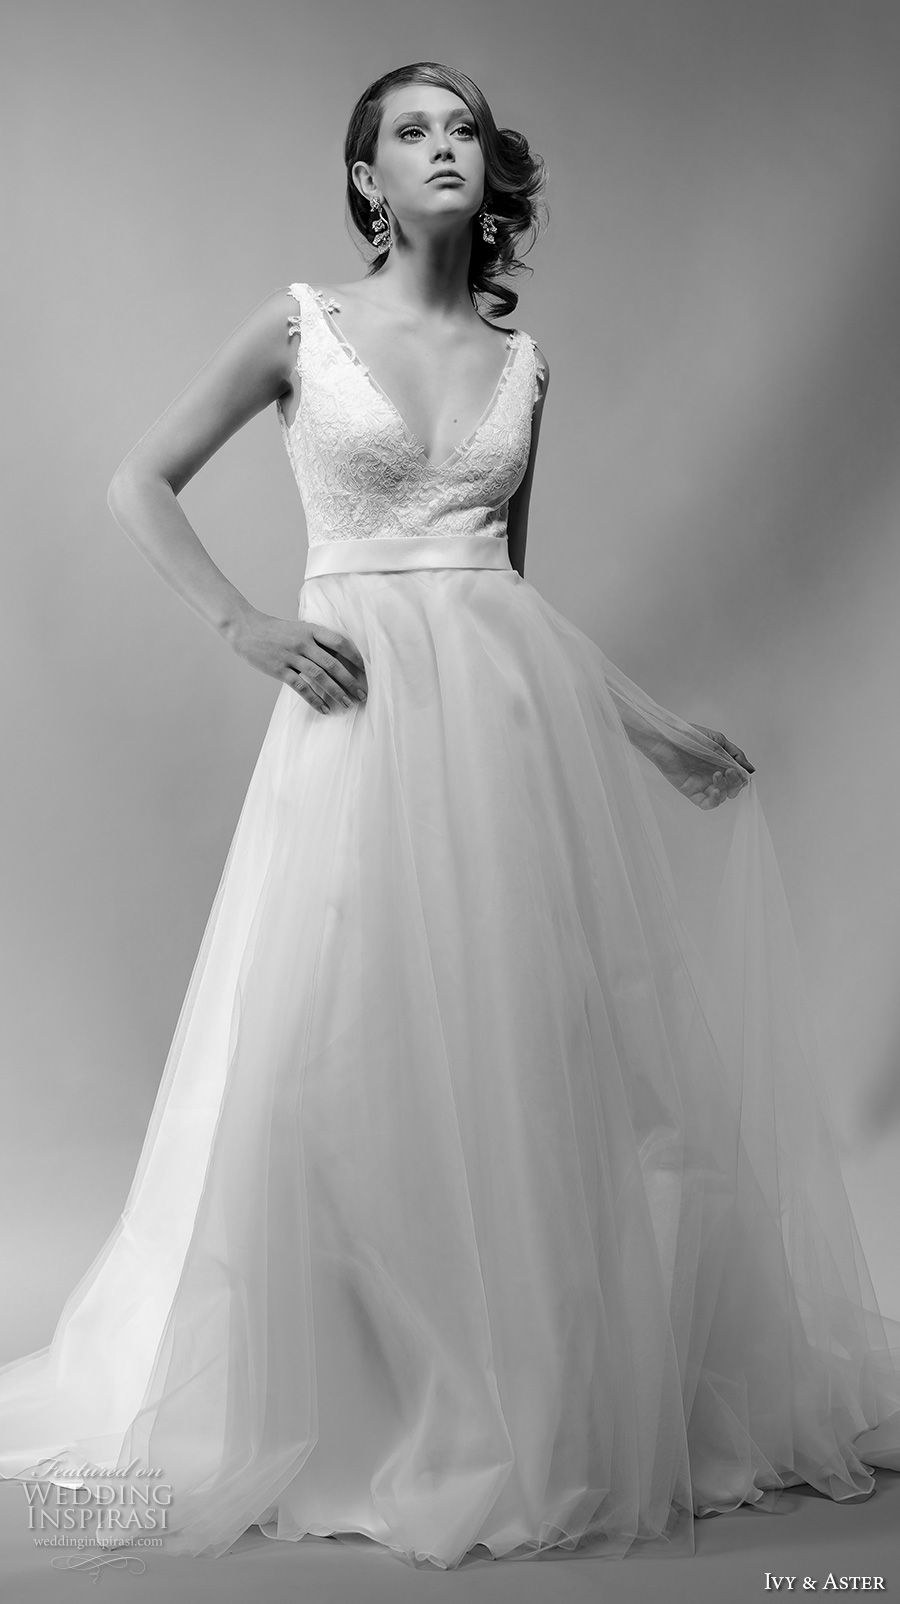 Ivy Aster Spring 2018 Wedding Dresses Wedding Inspirasi Wedding Dresses Sheer Wedding Dress Ivy And Aster [ 1604 x 900 Pixel ]